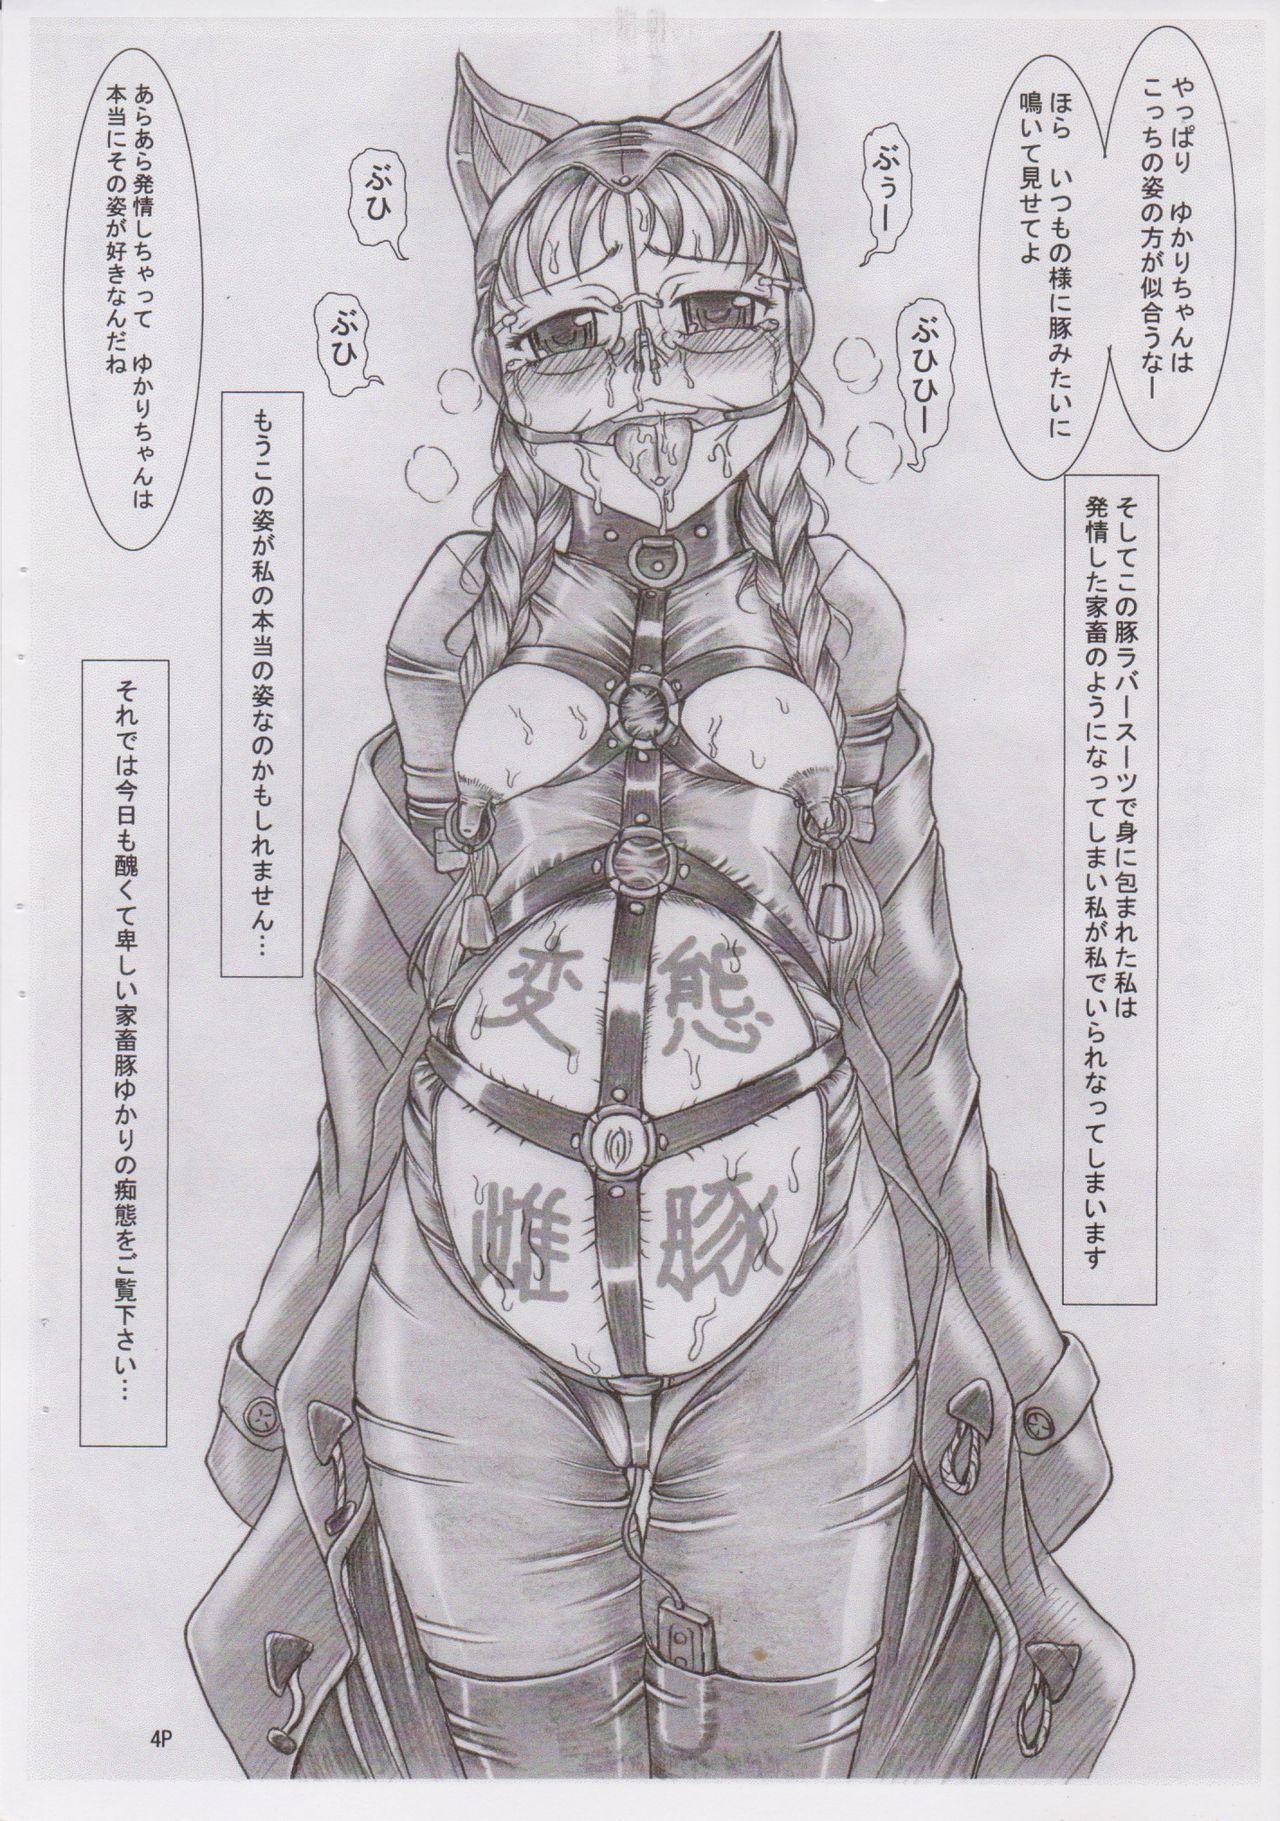 (C78) [Nekoneko Panchu! (Nekoneko Panchu)] Sanshimai Choukyou Yuugi [Yukari Hen] Yukari-chan no Butabana Kachiku Choukyou [Anal Higyaku Jugyou] 3